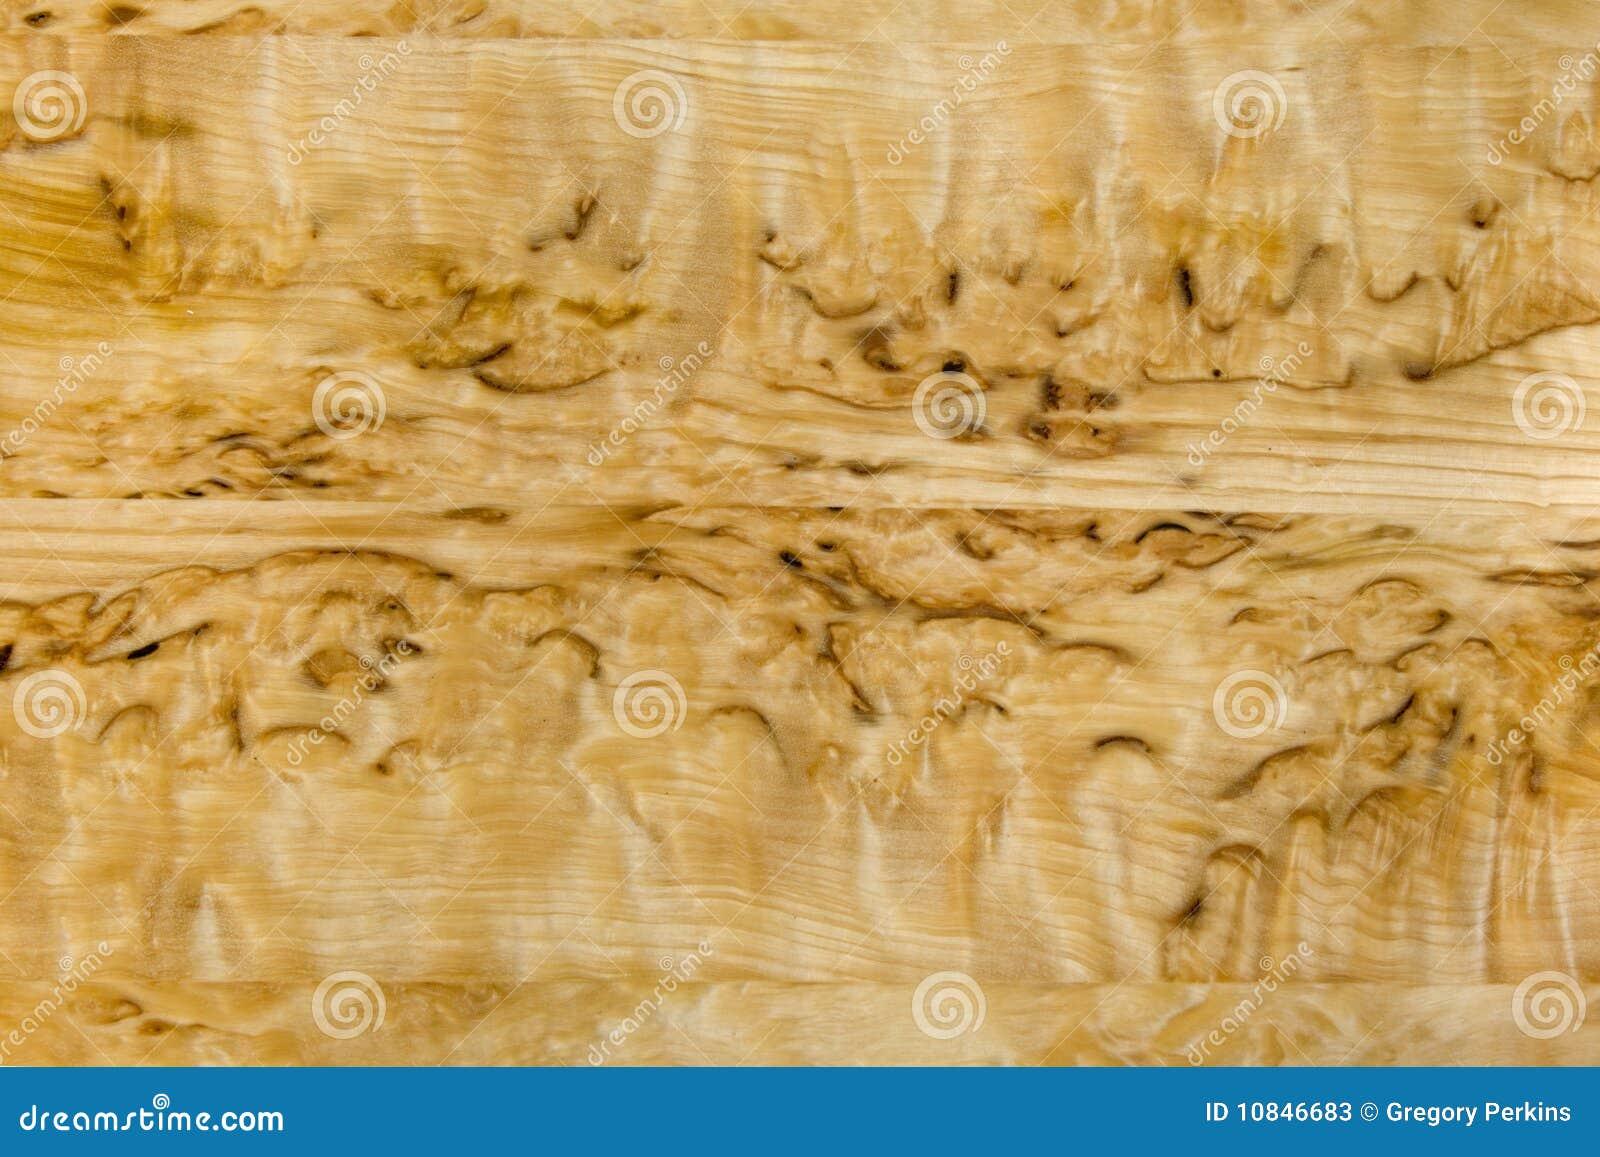 Attractive burled birch wood grain stock photos image